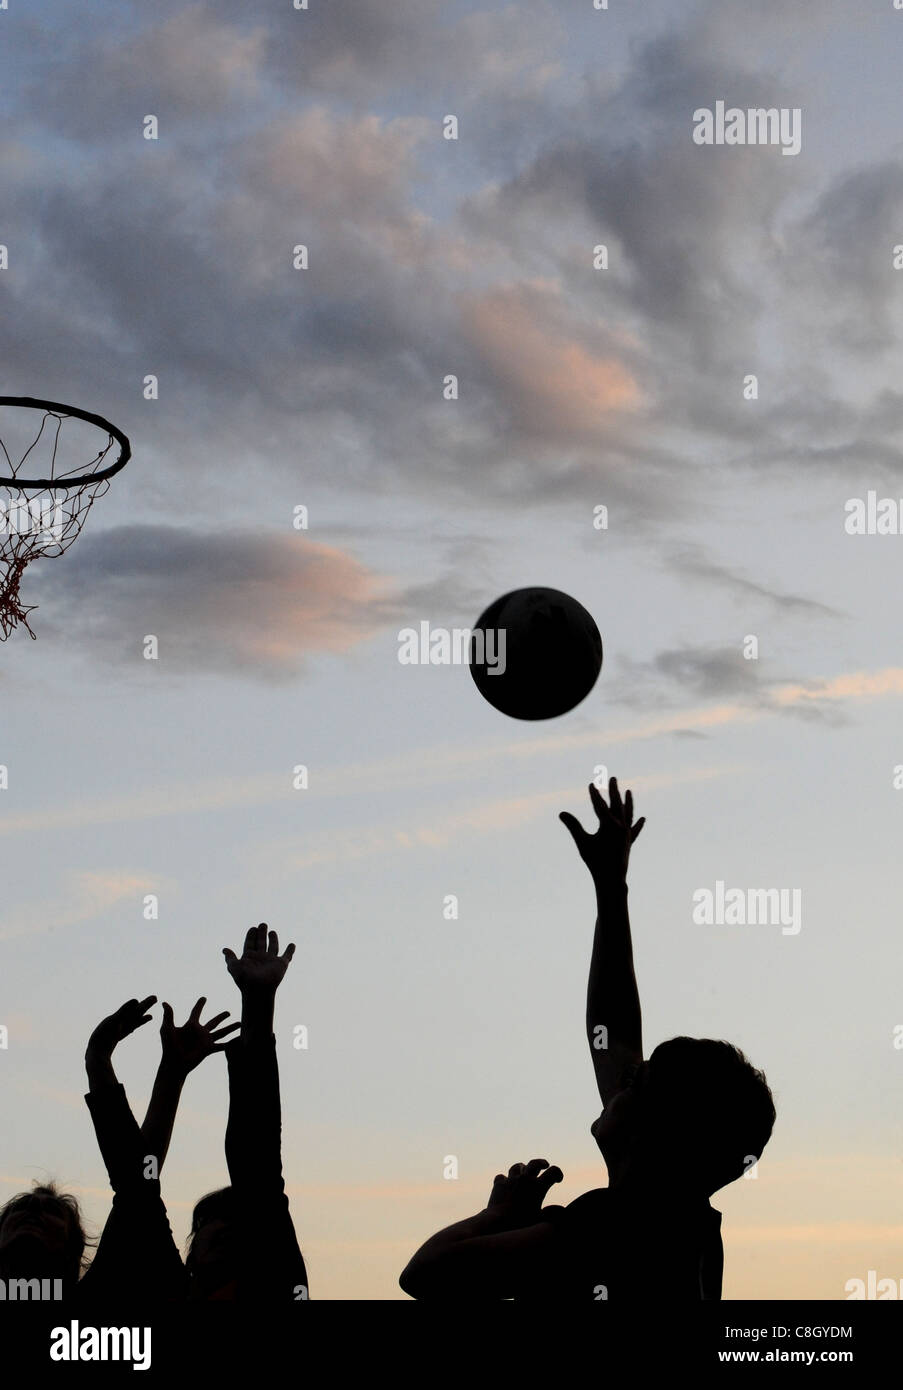 Un jugador de baloncesto femenino disparar a un objetivo. Imagen De Stock